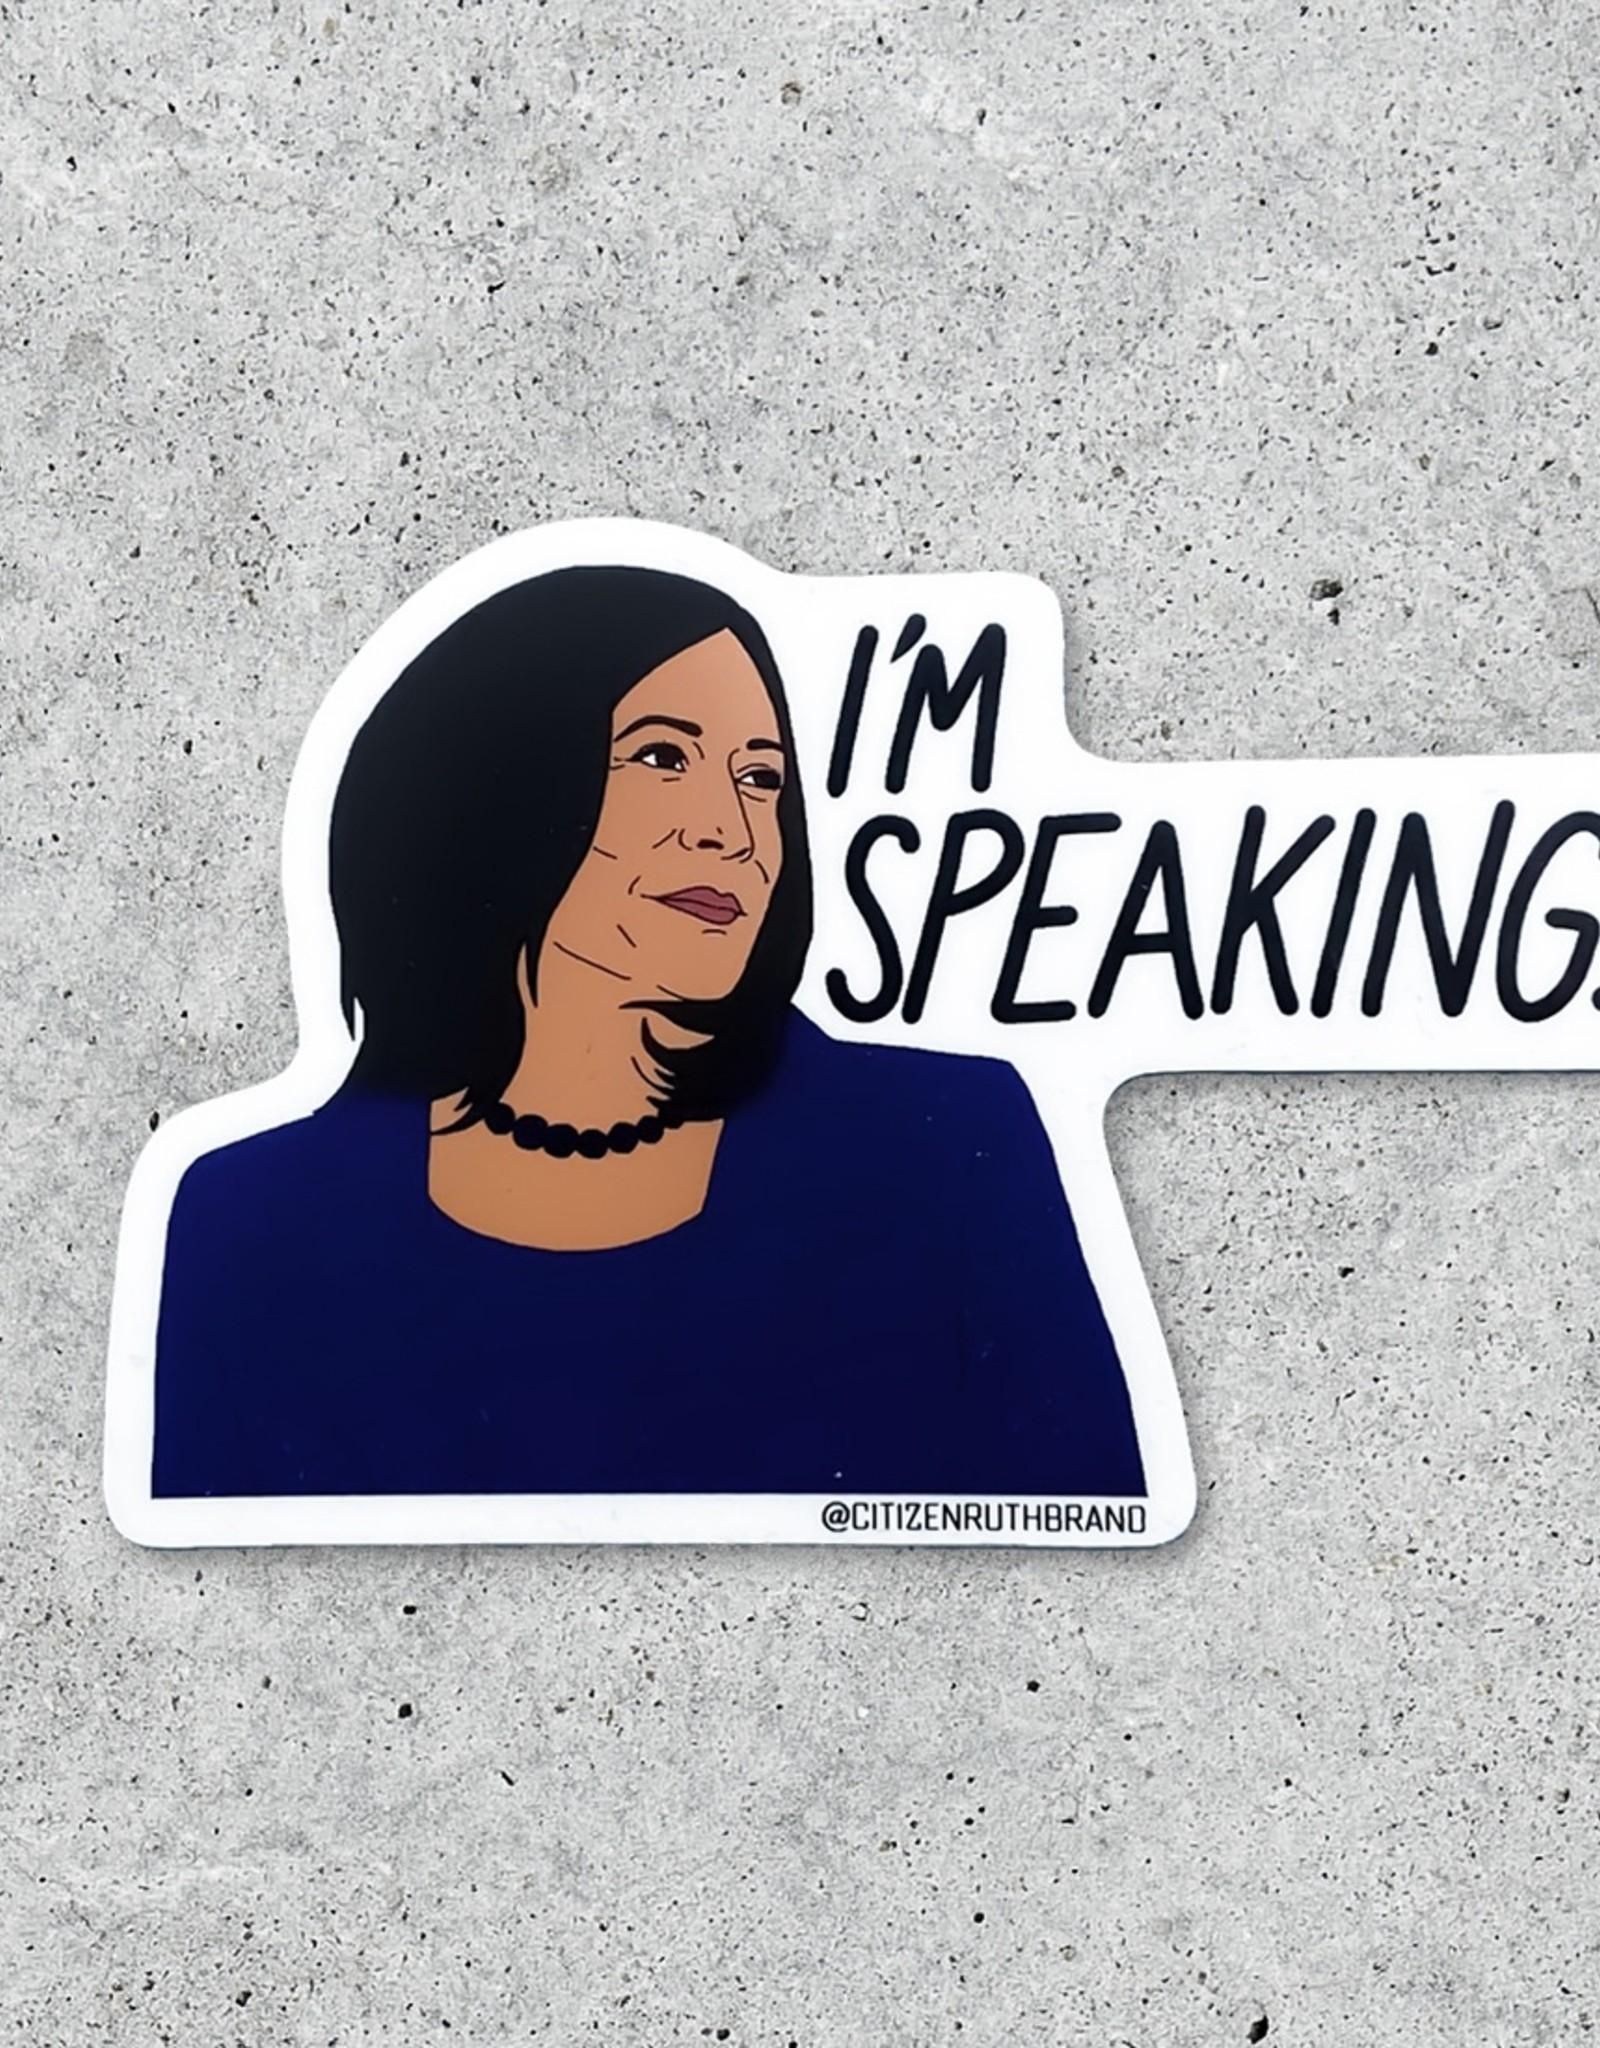 Citizen Ruth Sticker: Kamala I'm speaking